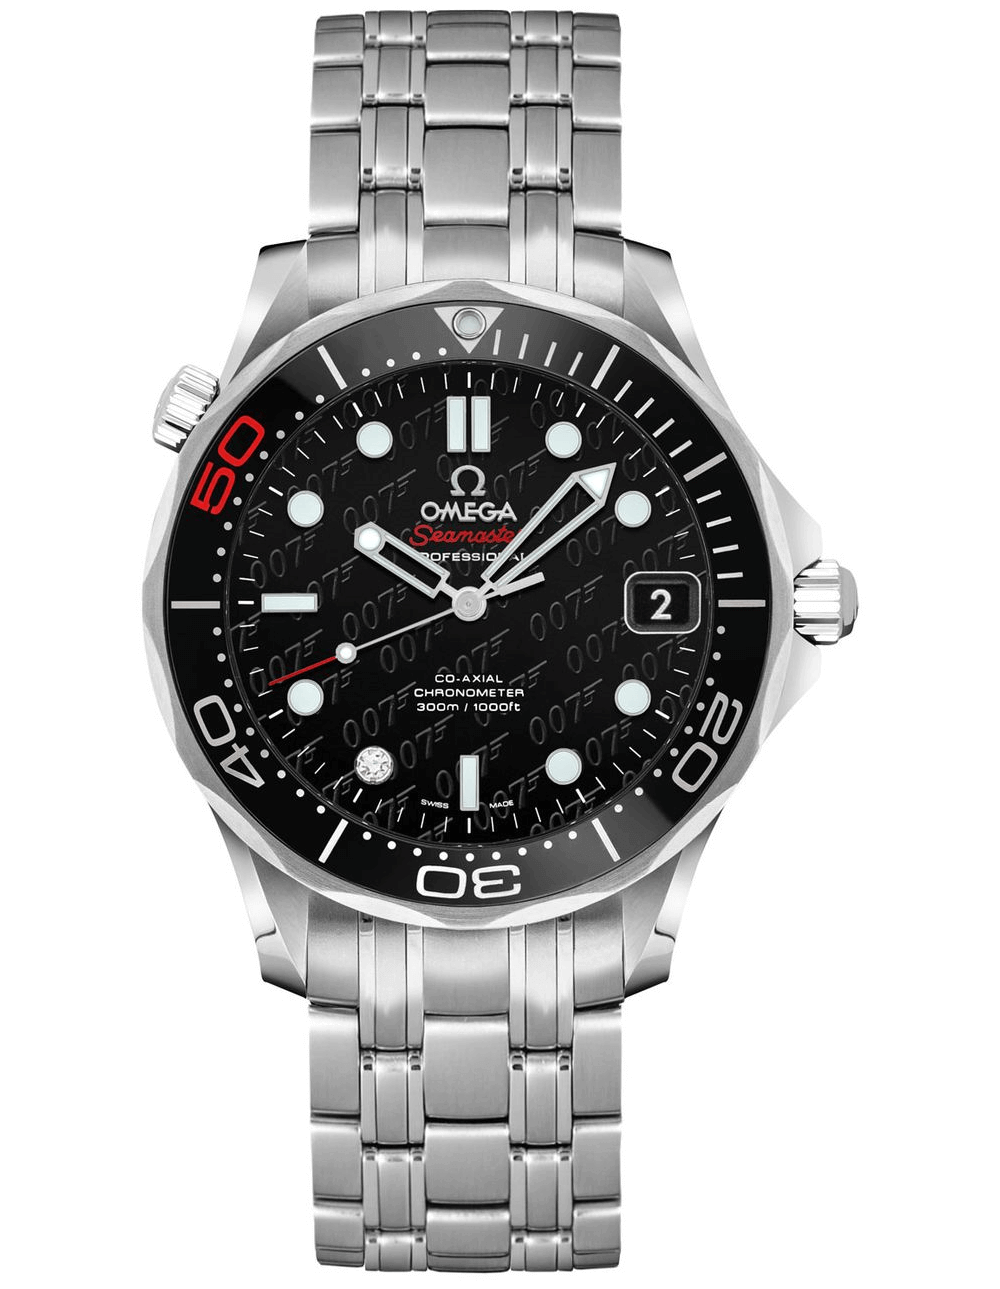 Đồng hồ Omega Seamaster Diver 300M Ref. 212.30.36.20.51.001 - James Bond 50th Anniversary (Midsize)